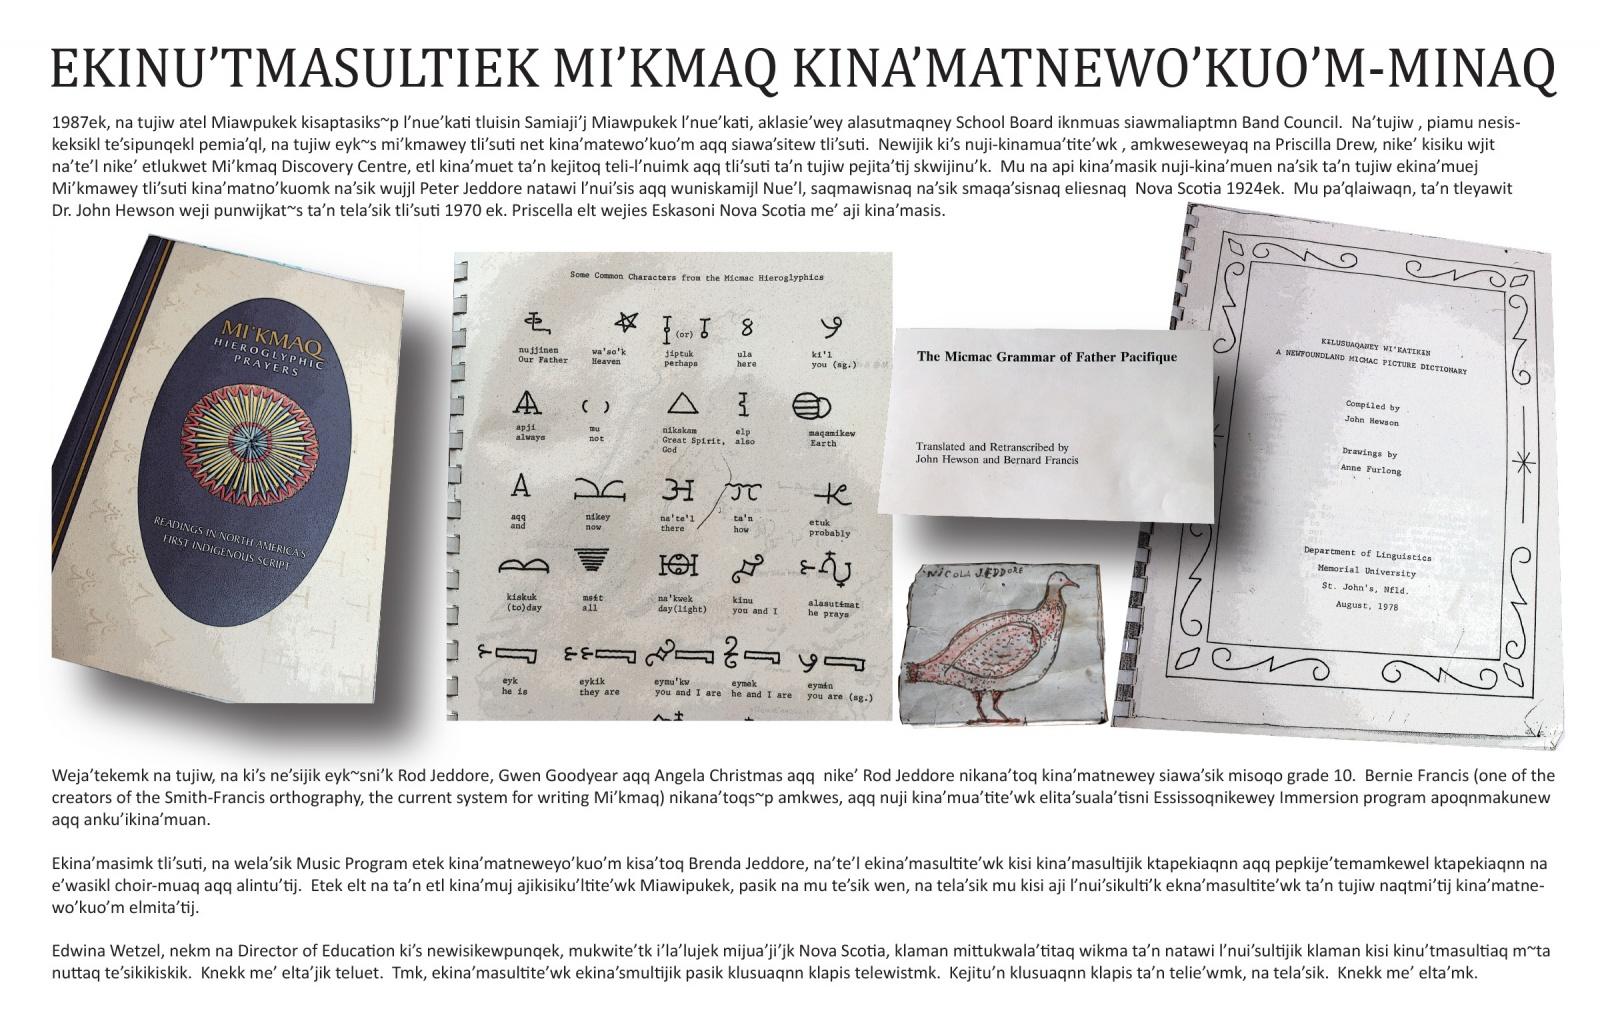 Ekinu'tmasultiek Mi'kmaq Kina'matnewo'kuo'm-minaq